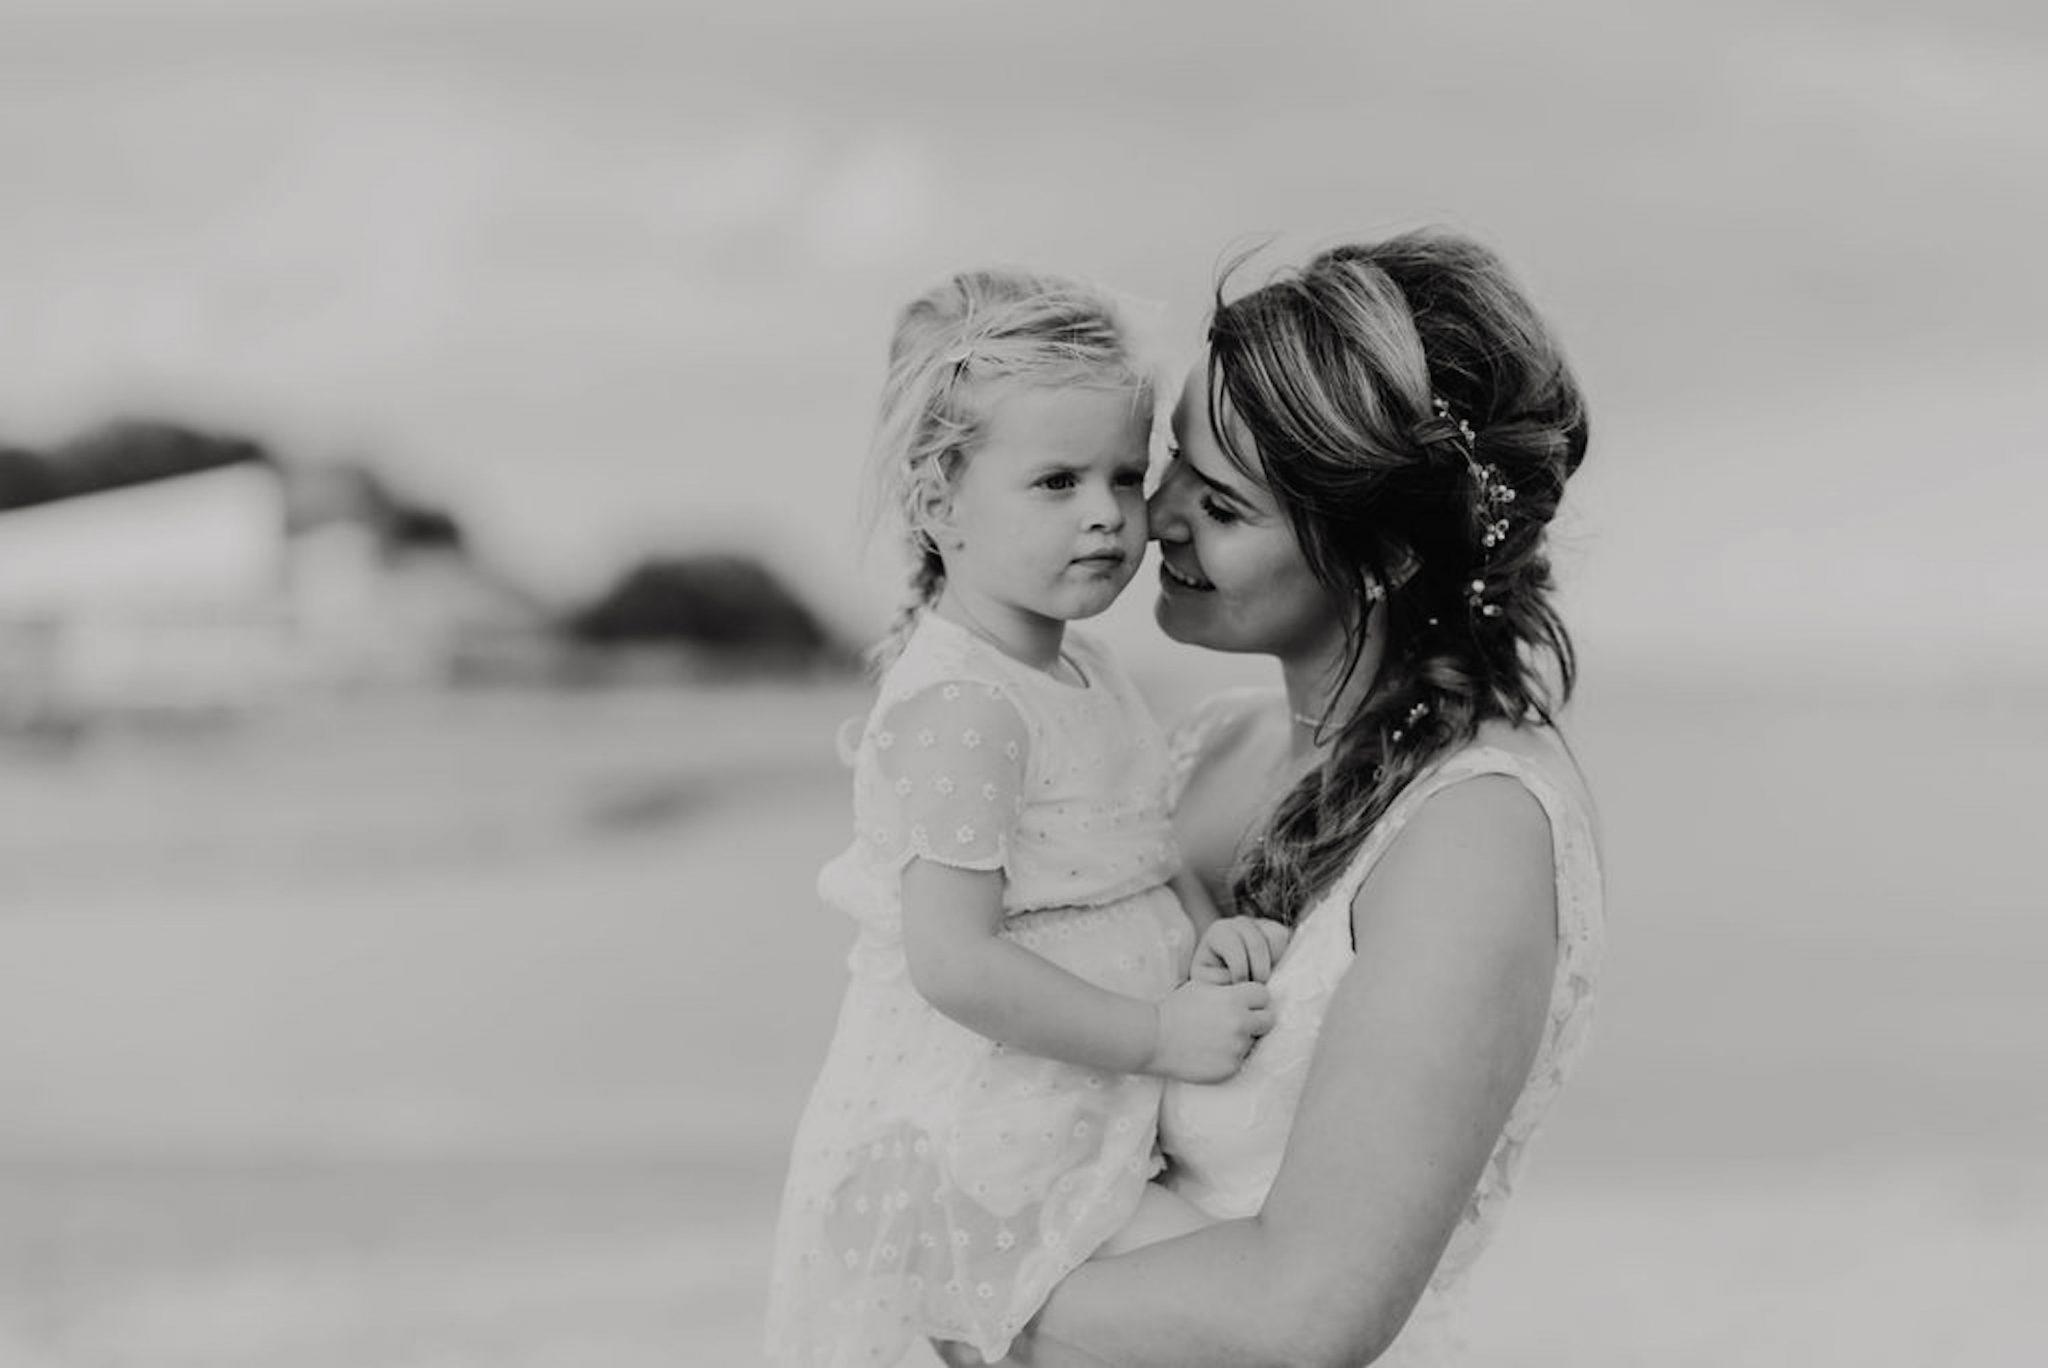 Hanneke Peters Couture - handgemaakte trouwjurk unieke trouwjurk laten maken, strandhuwelijk strand trouwjurk